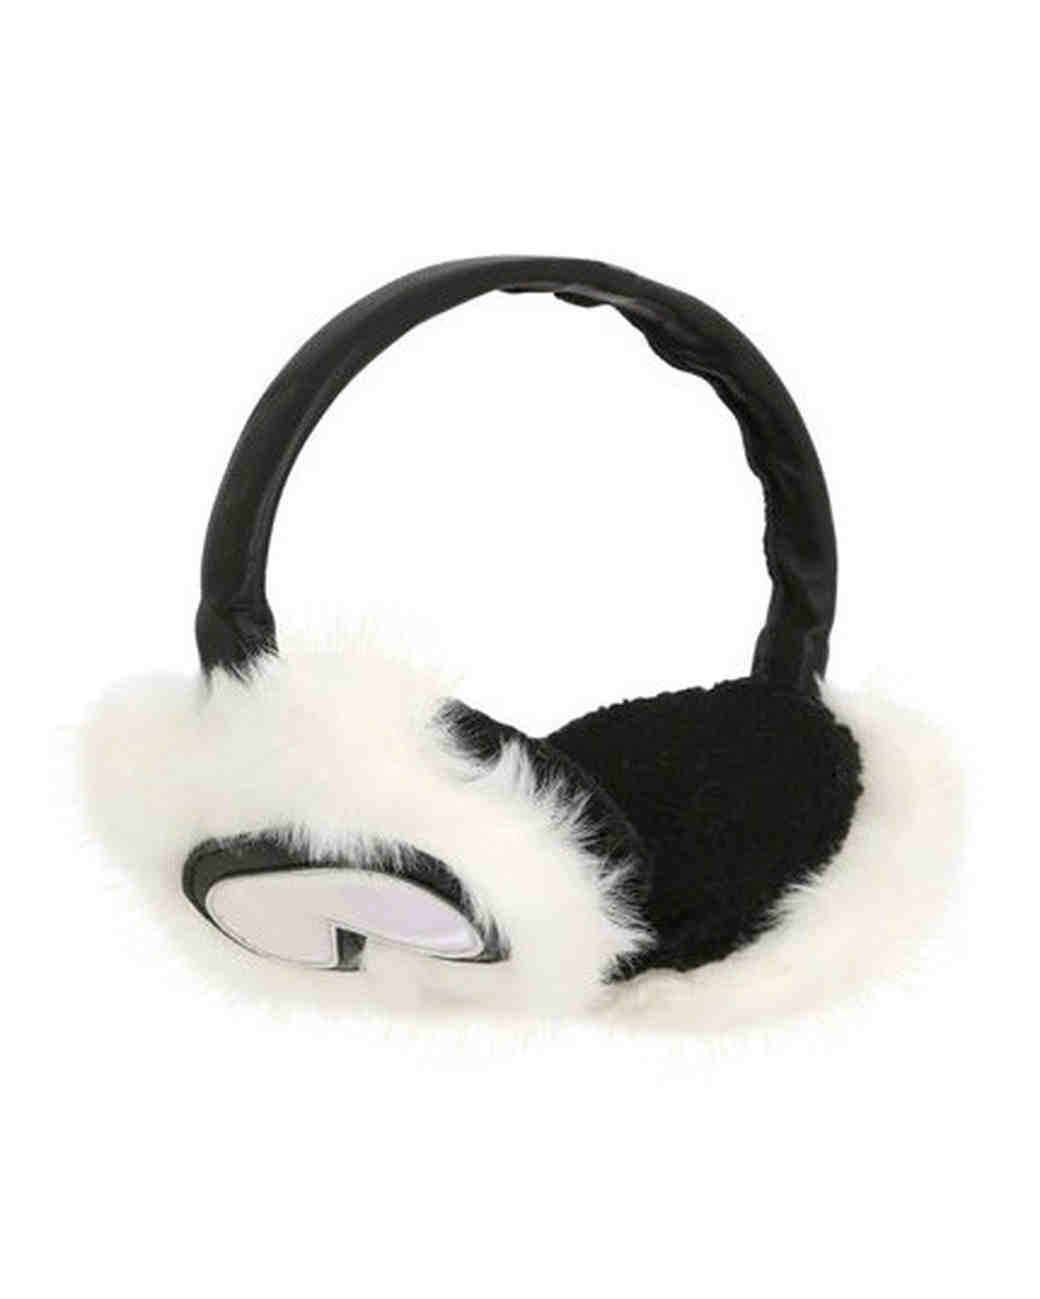 karl lagerfeld holiday faux fur ear muffs